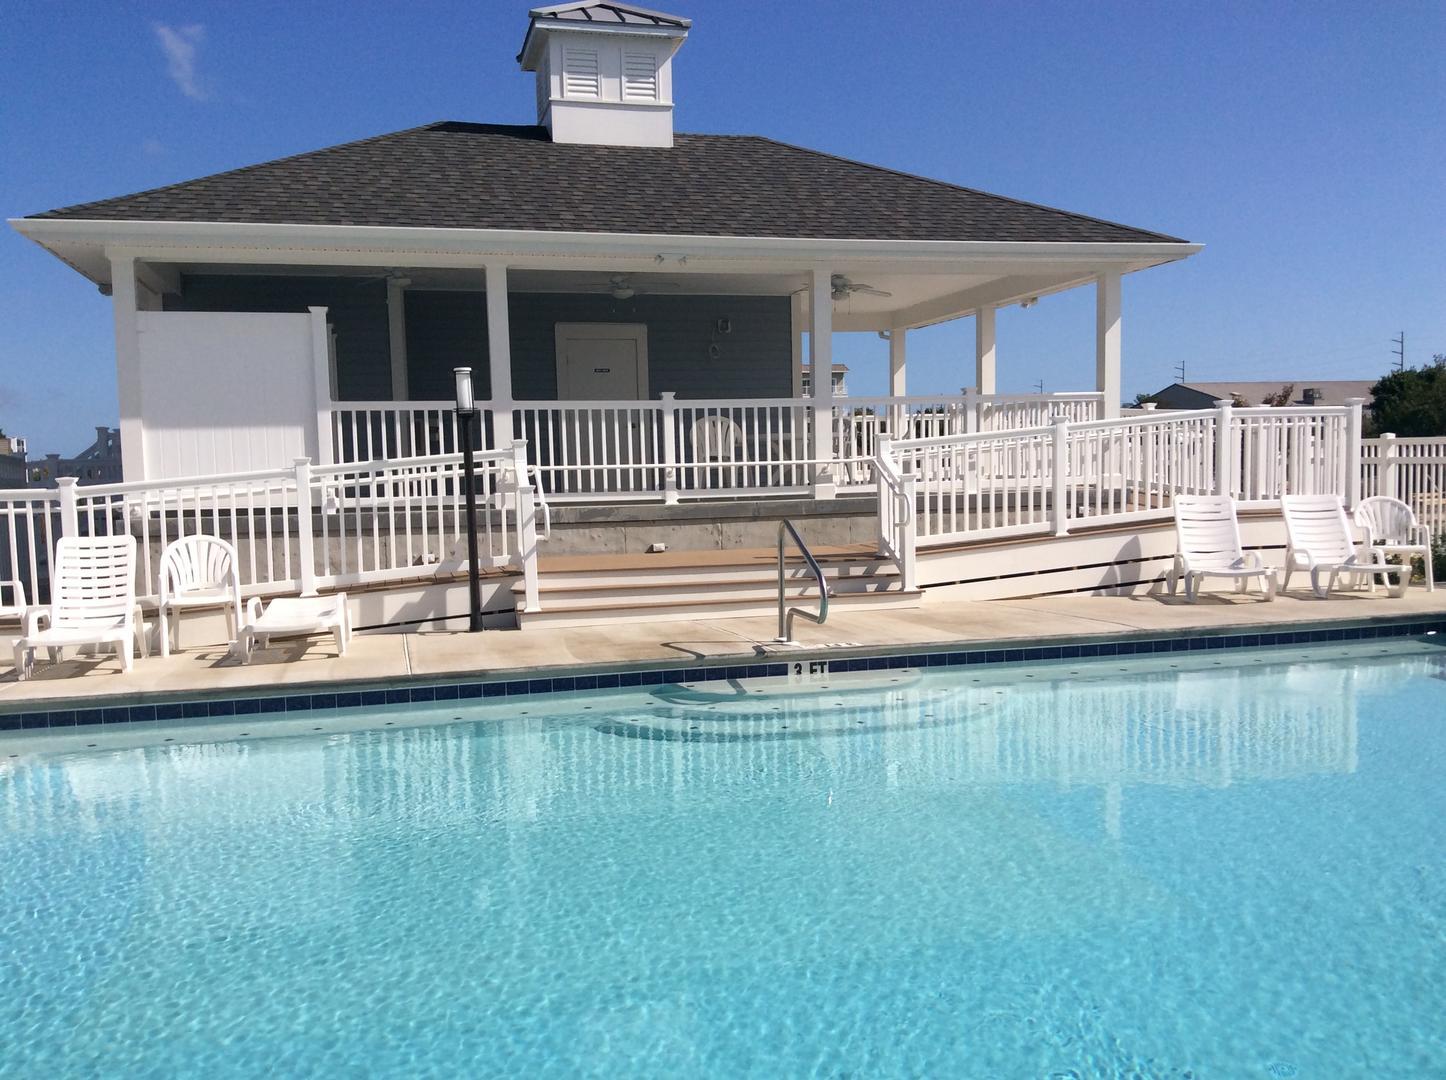 Broad Marsh - Pool Area and Club House